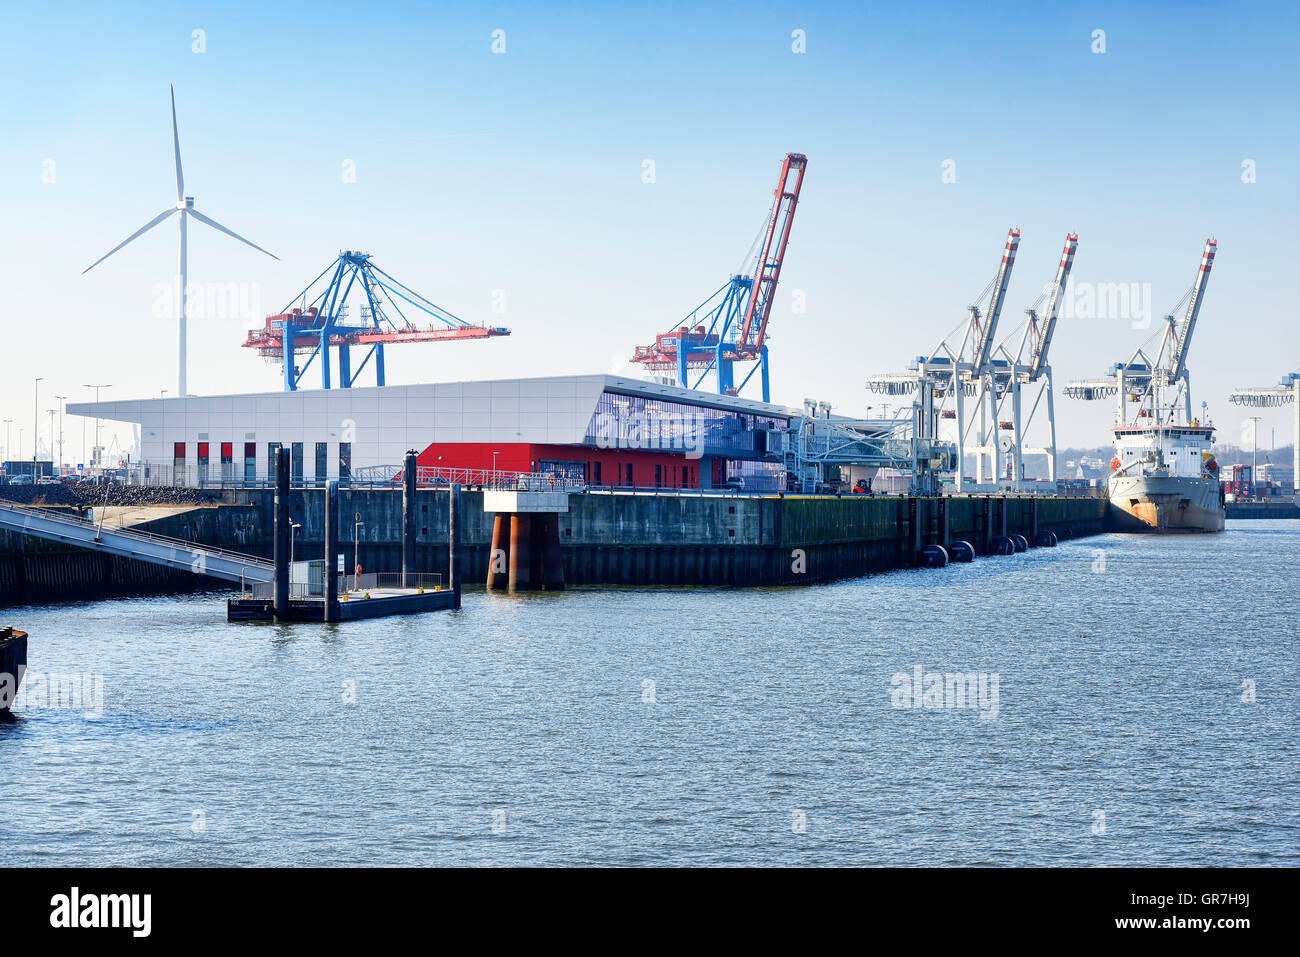 Cruise Terminal Steinwerder In Hamburg, Germany - Stock Image